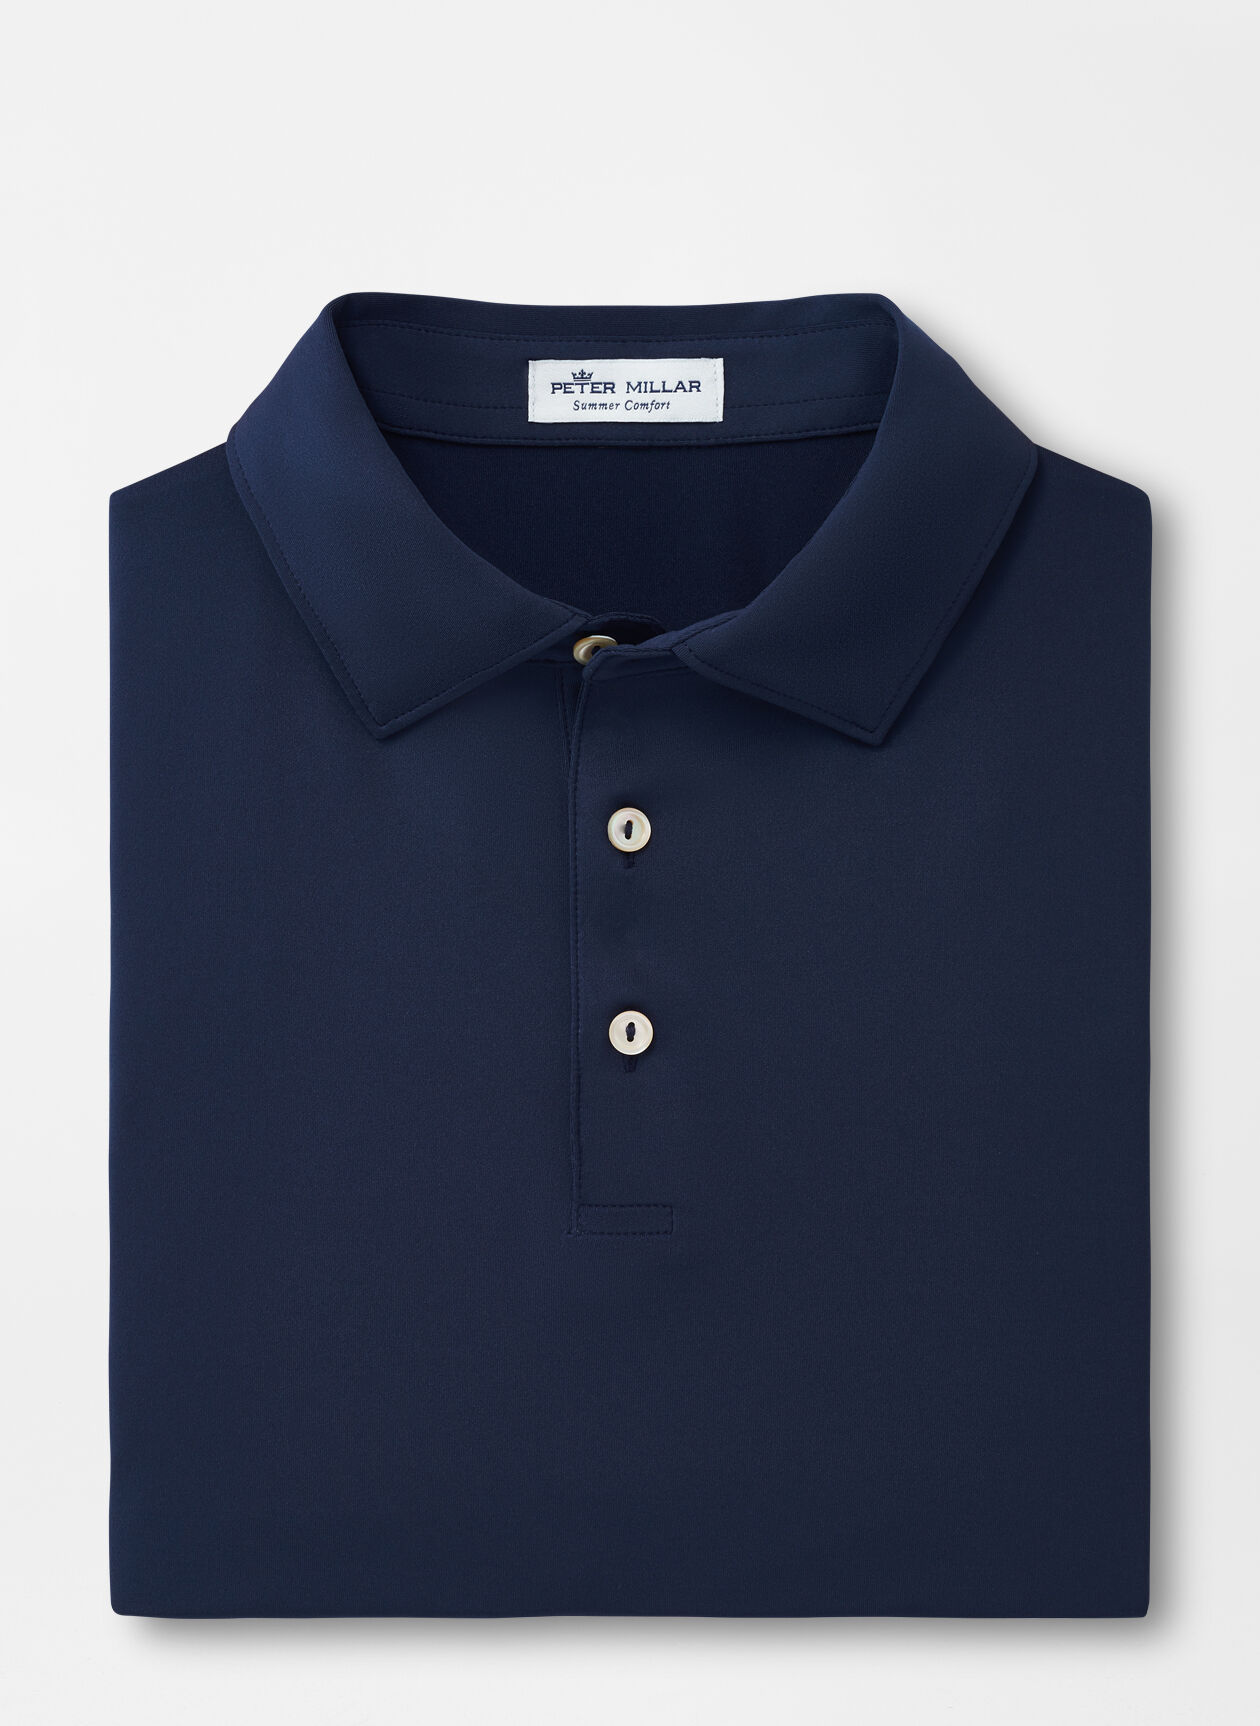 Solid Navy Shirt